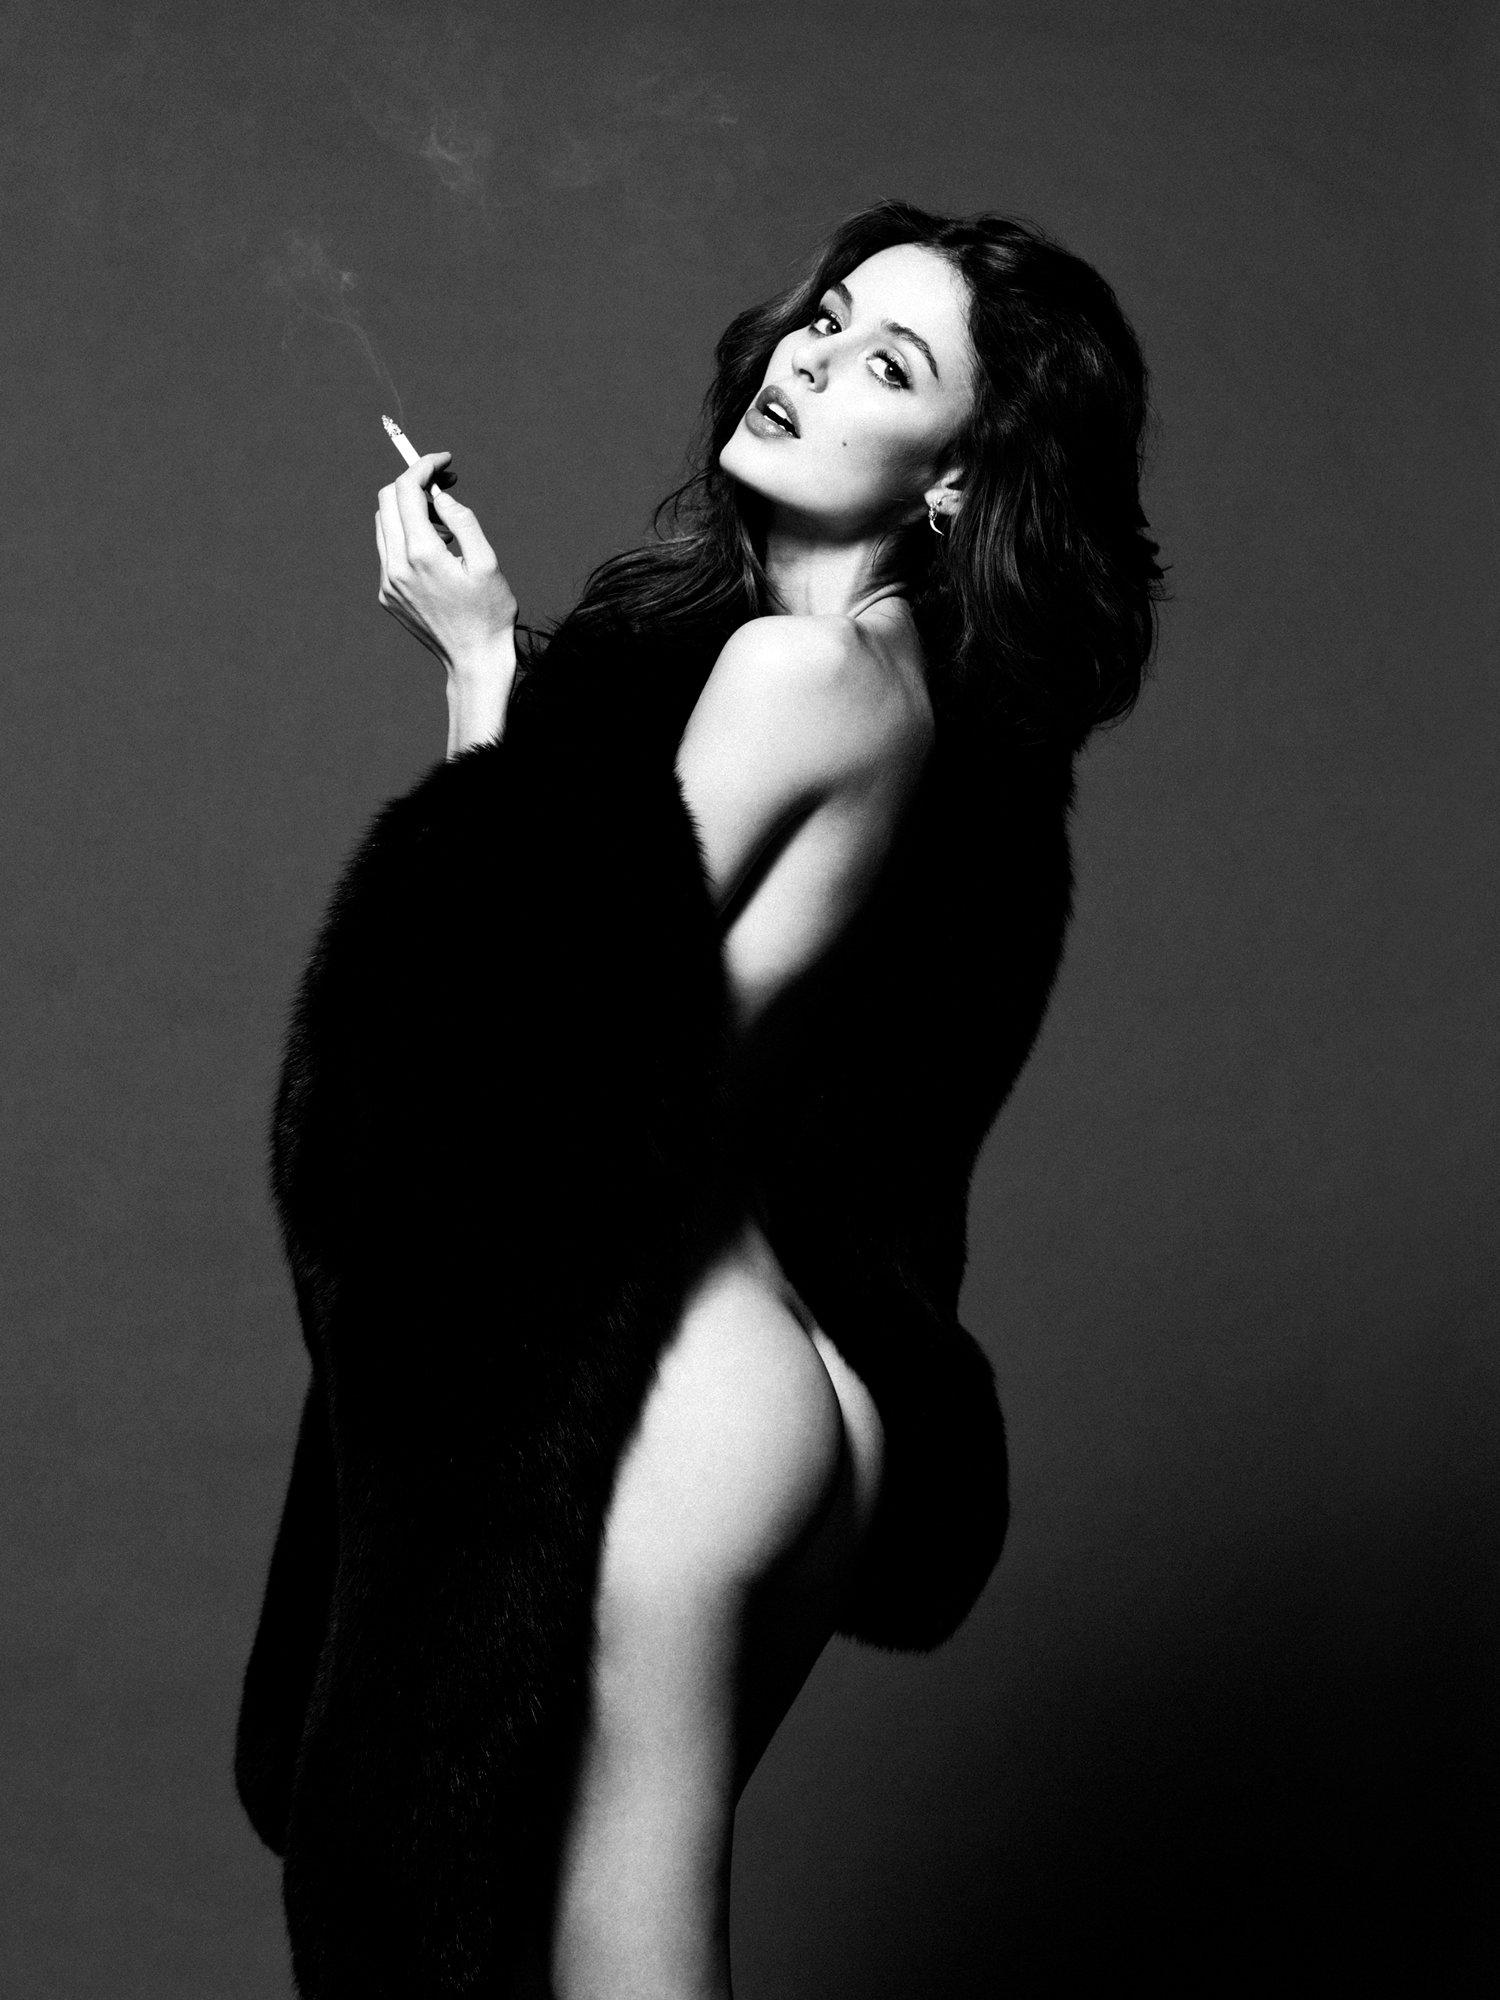 Nicole Trunfio фото для журнала LoveCat Magazine.